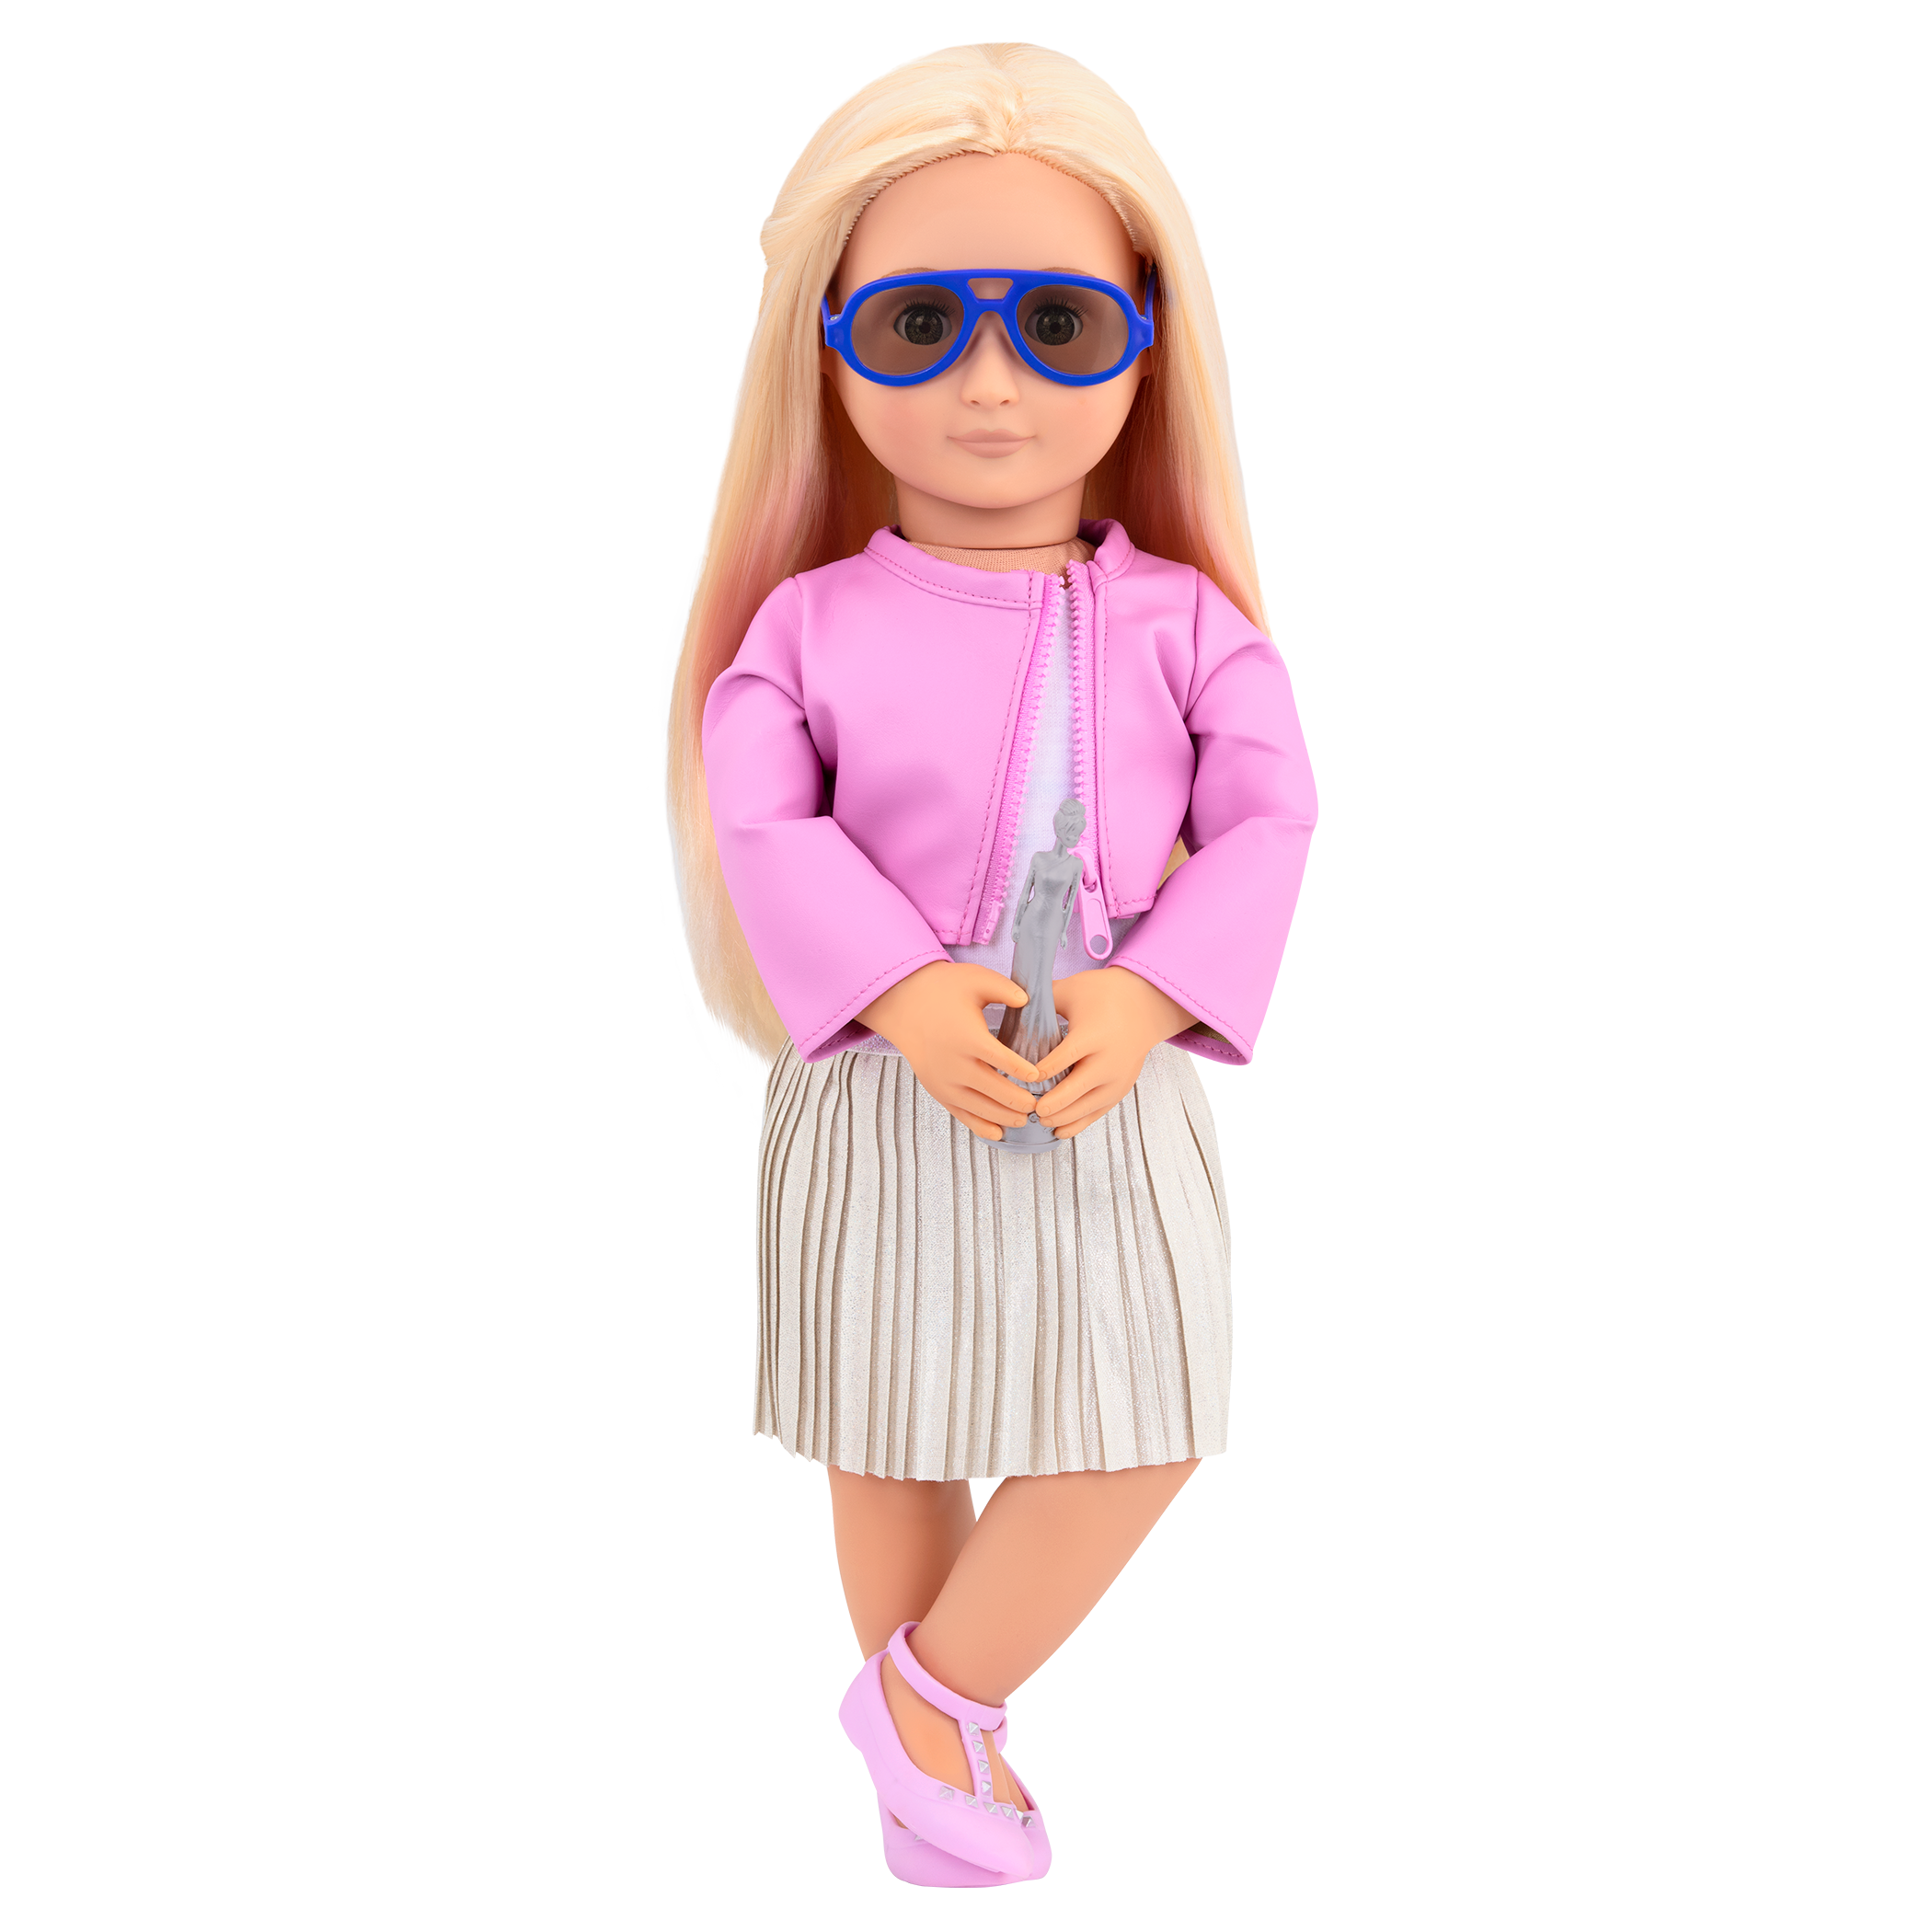 Ginger wearing sunglasses in Winning Wardrobe